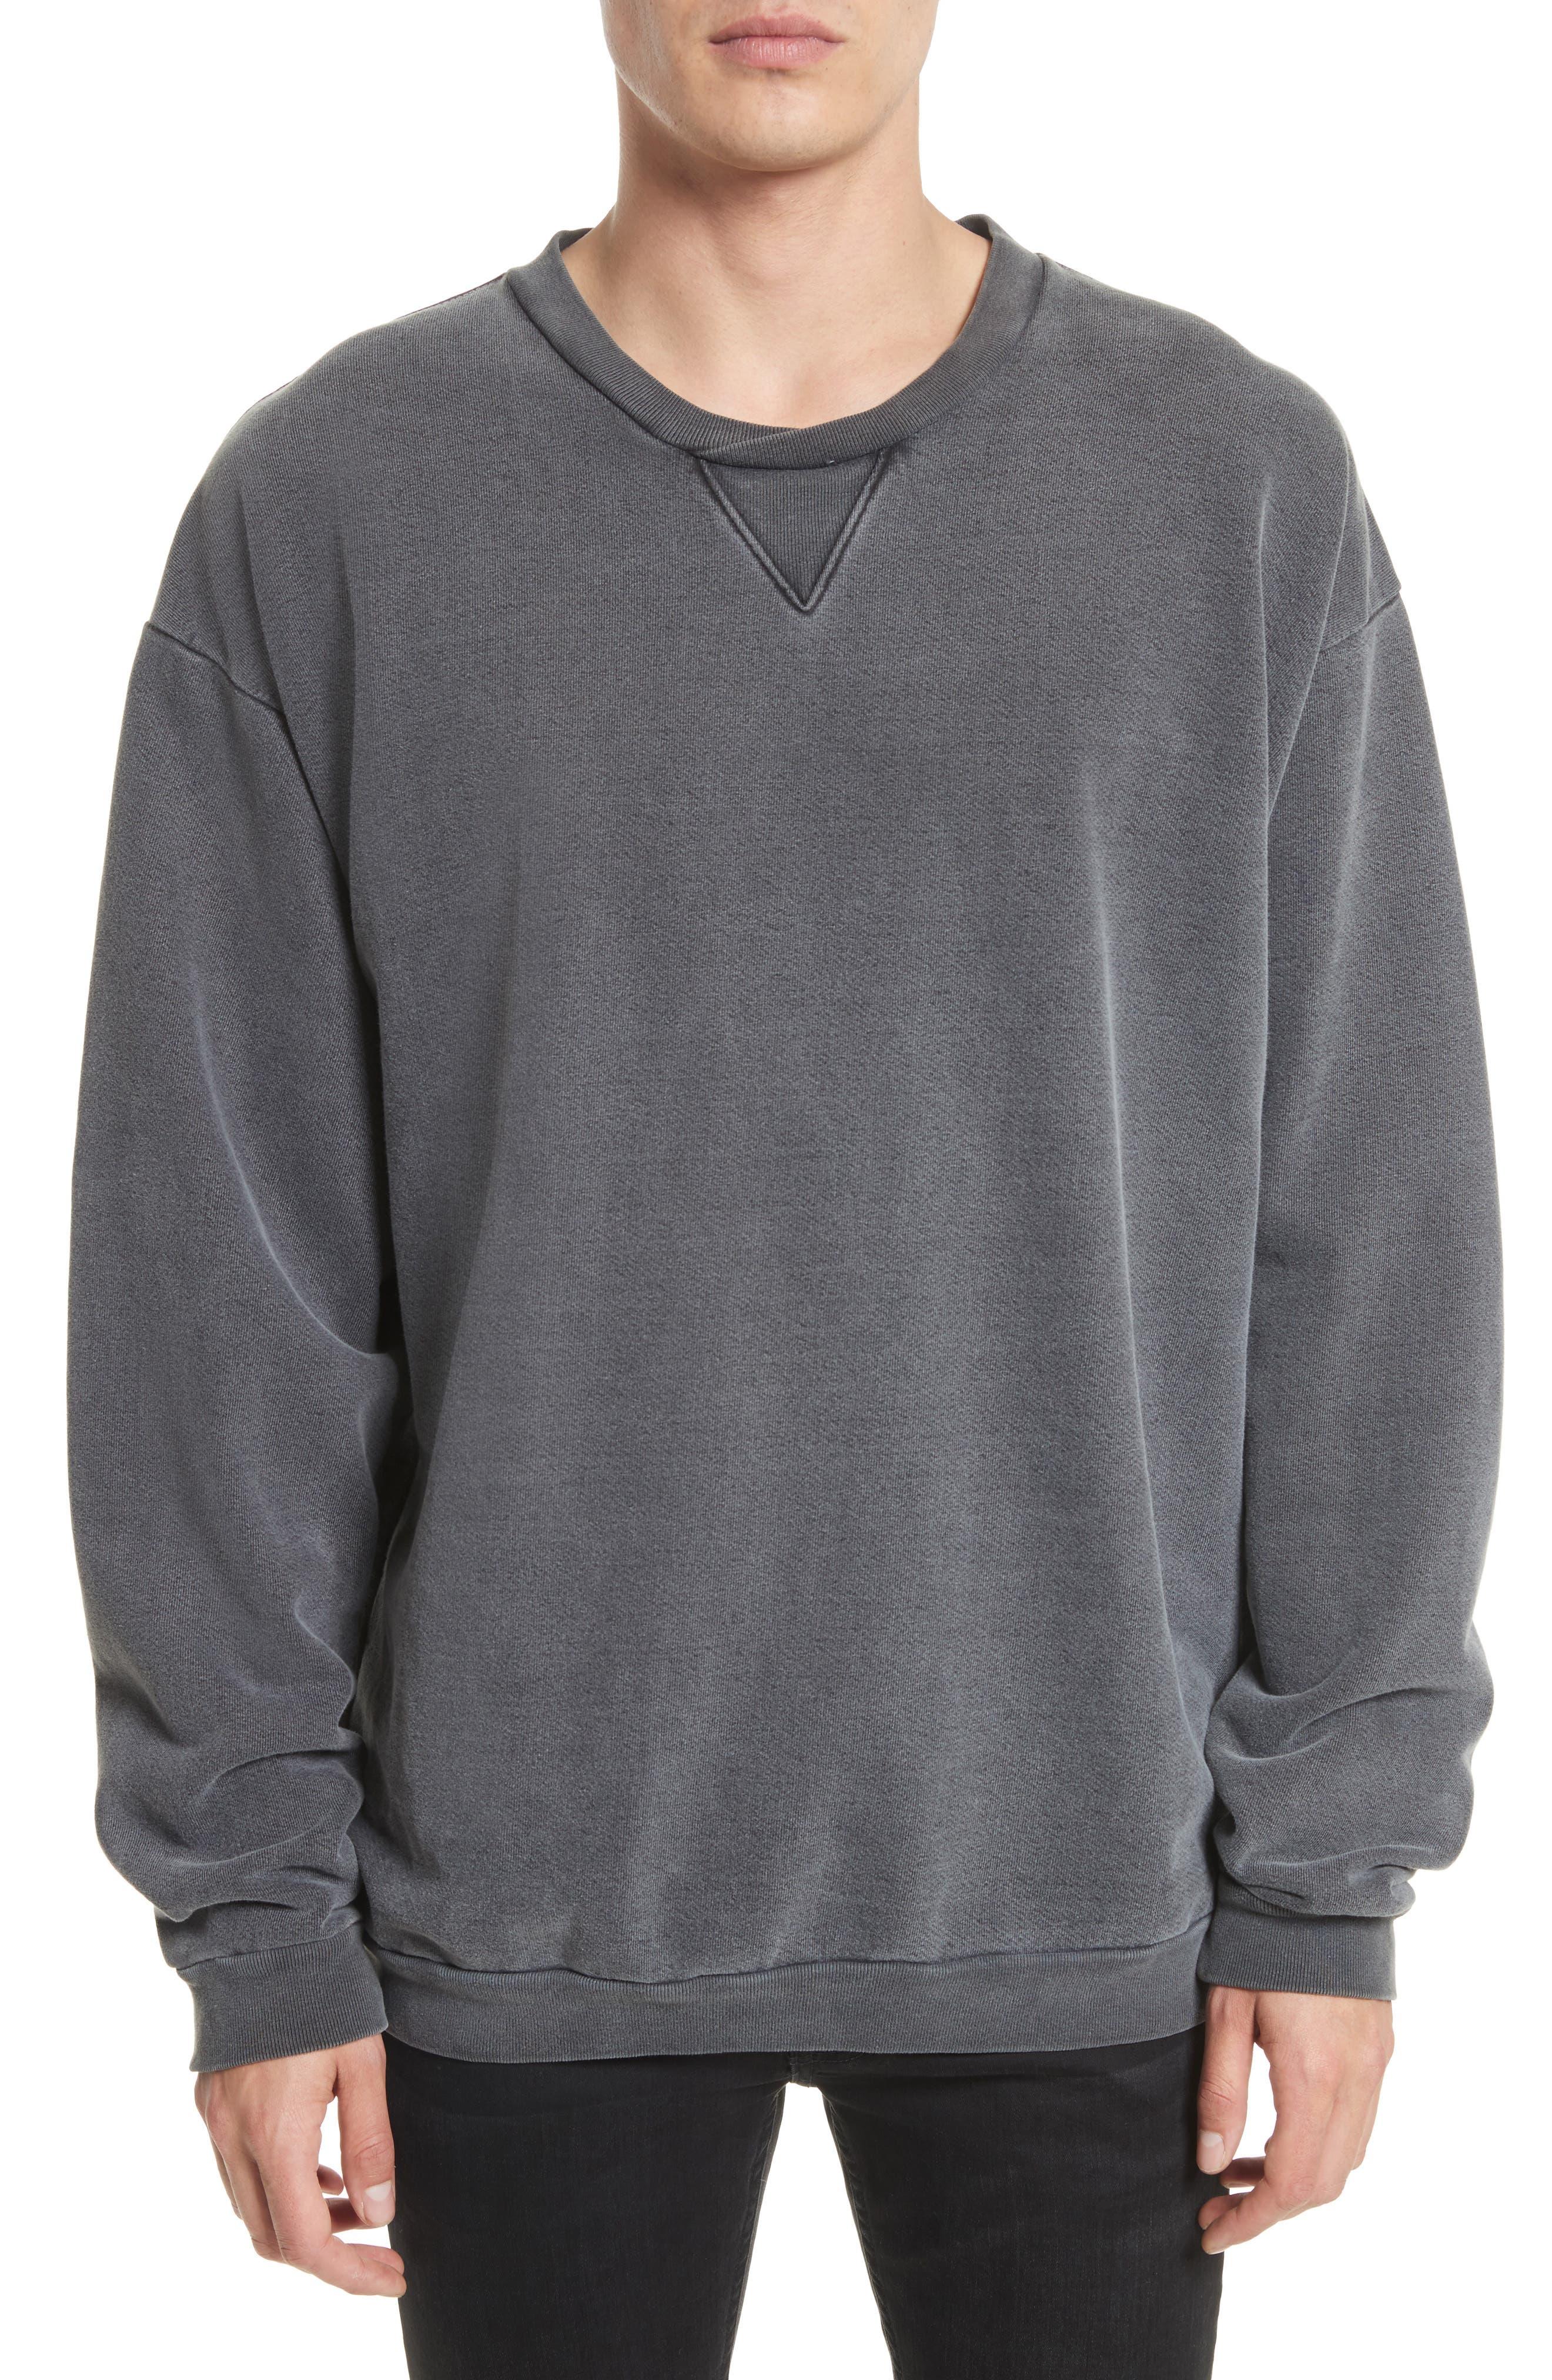 Norton Sweatshirt,                             Main thumbnail 1, color,                             Black Pigment